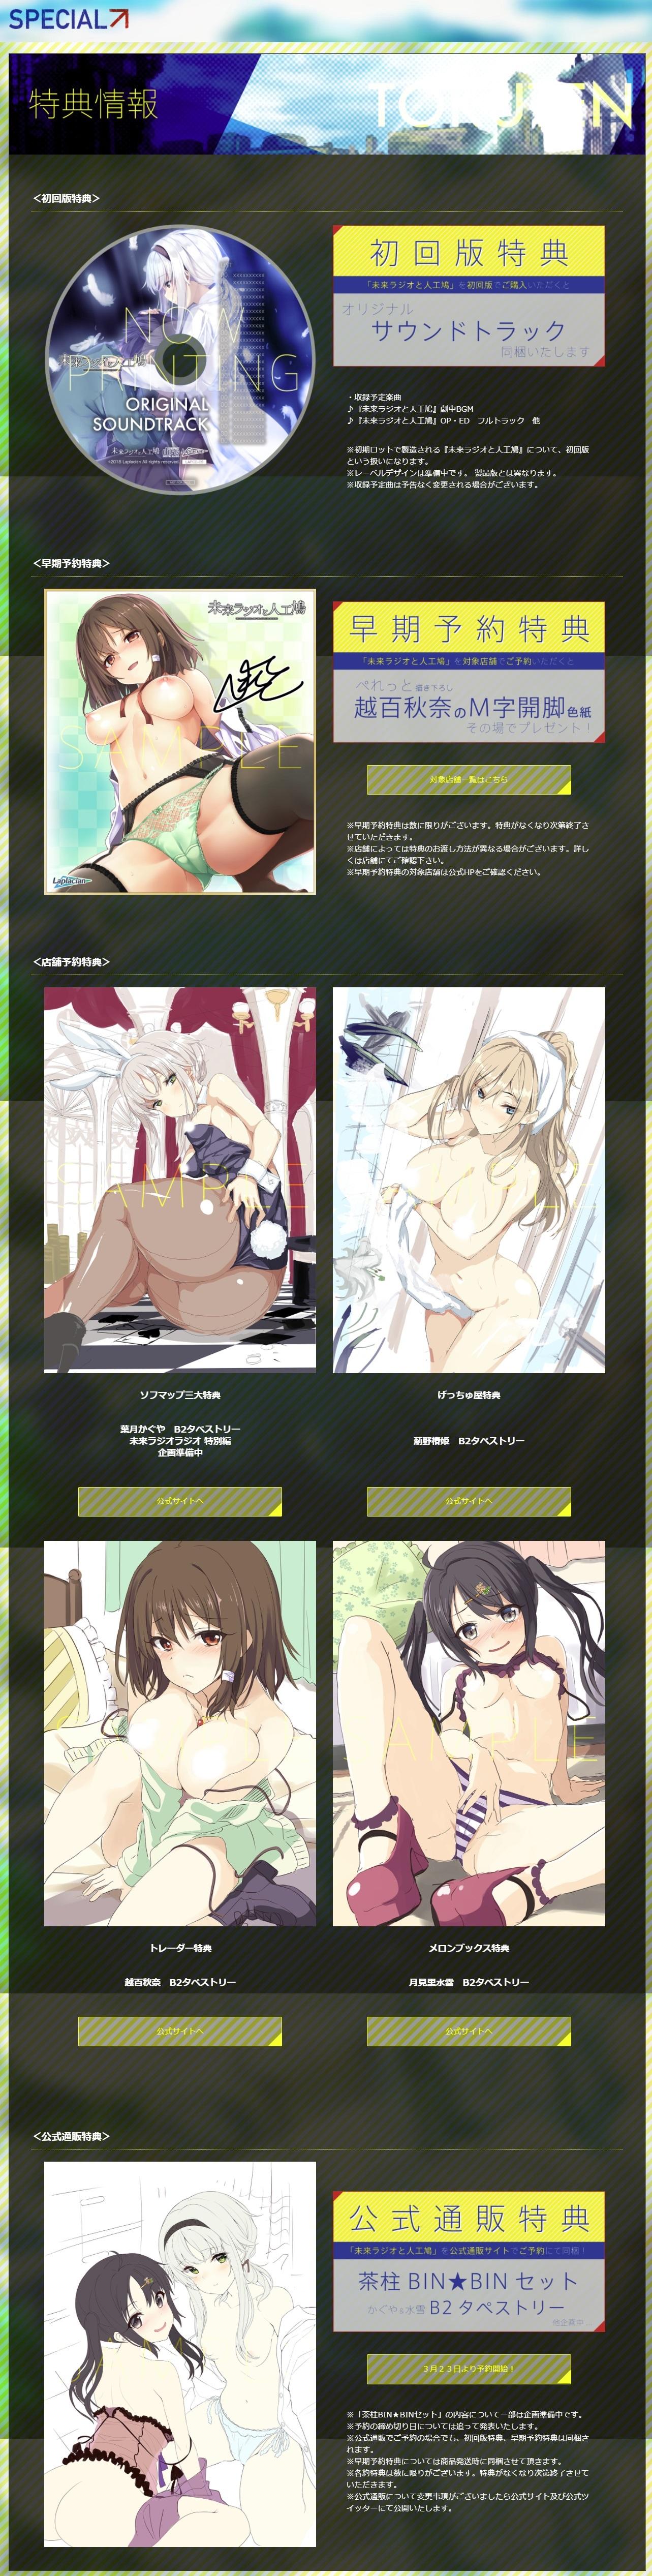 screencapture-laplacian-jp-radio-special-php-2018-03-24-19_14_49.jpg